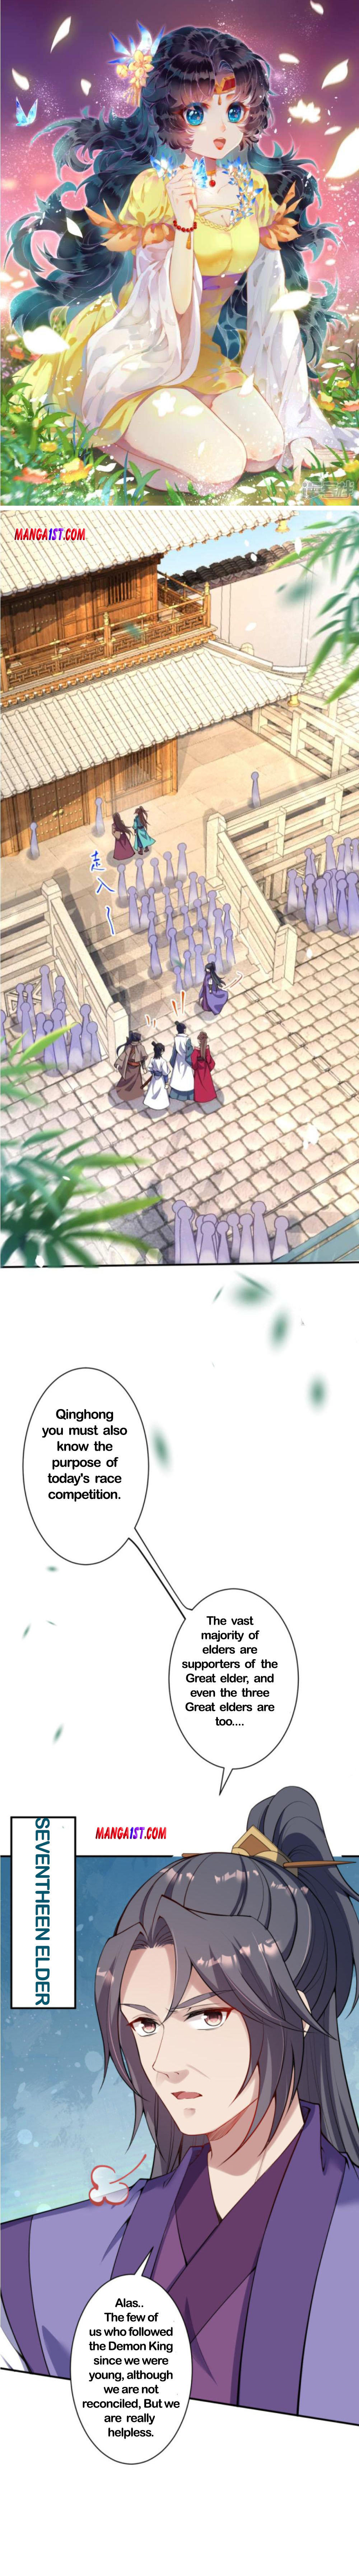 Against The Gods Chapter 338 page 1 - Mangakakalots.com